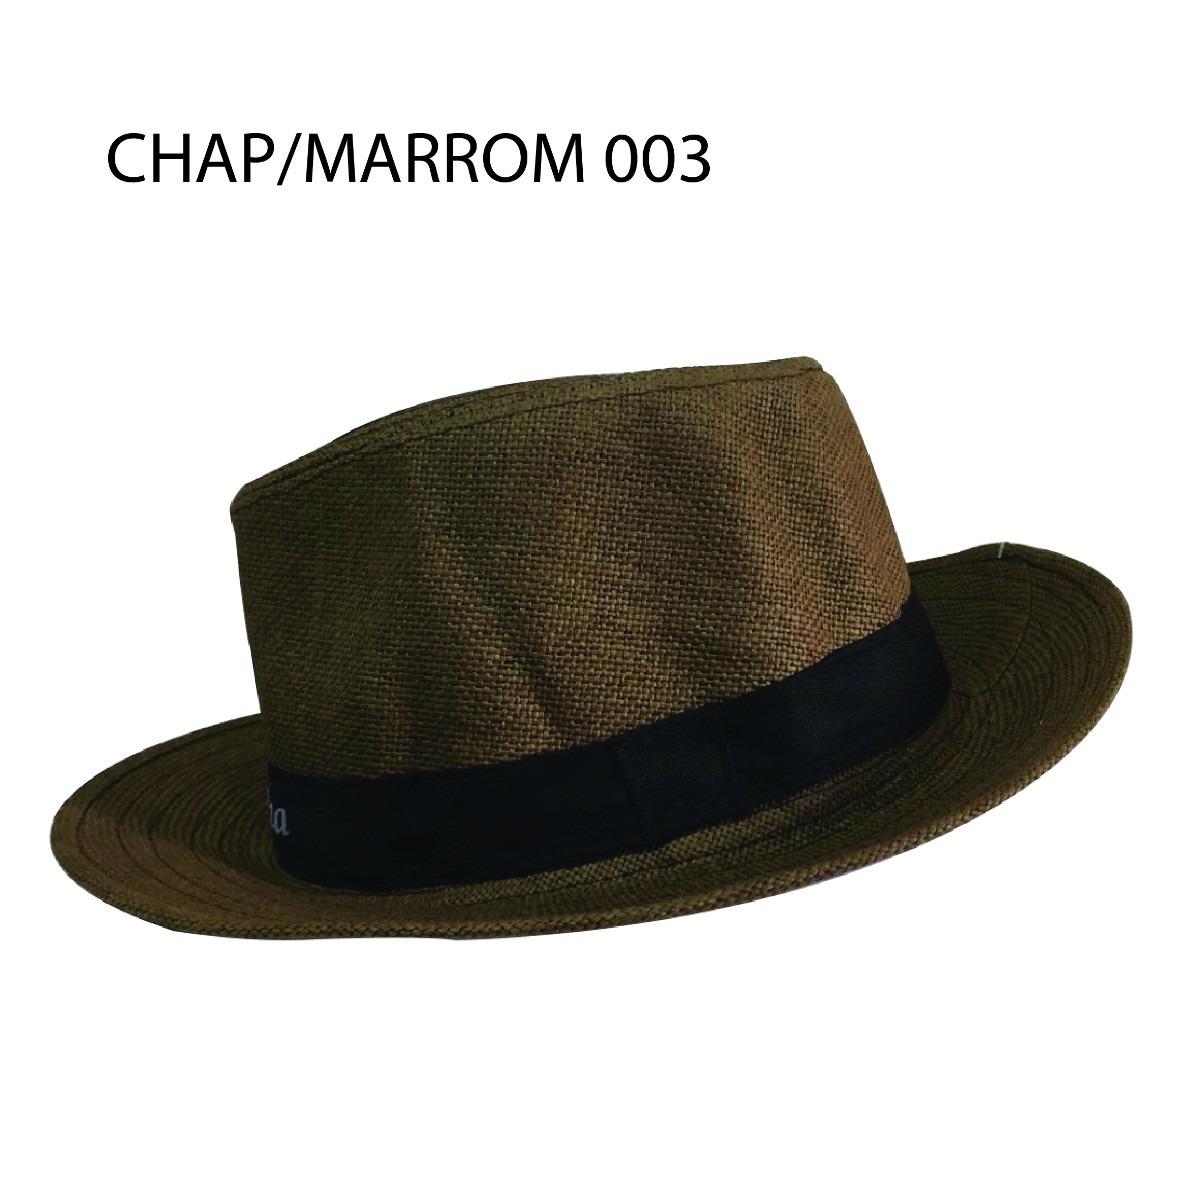 chapéu tipo panamá modelo social clássico unissex moda praia. Carregando  zoom. fde0ee58426